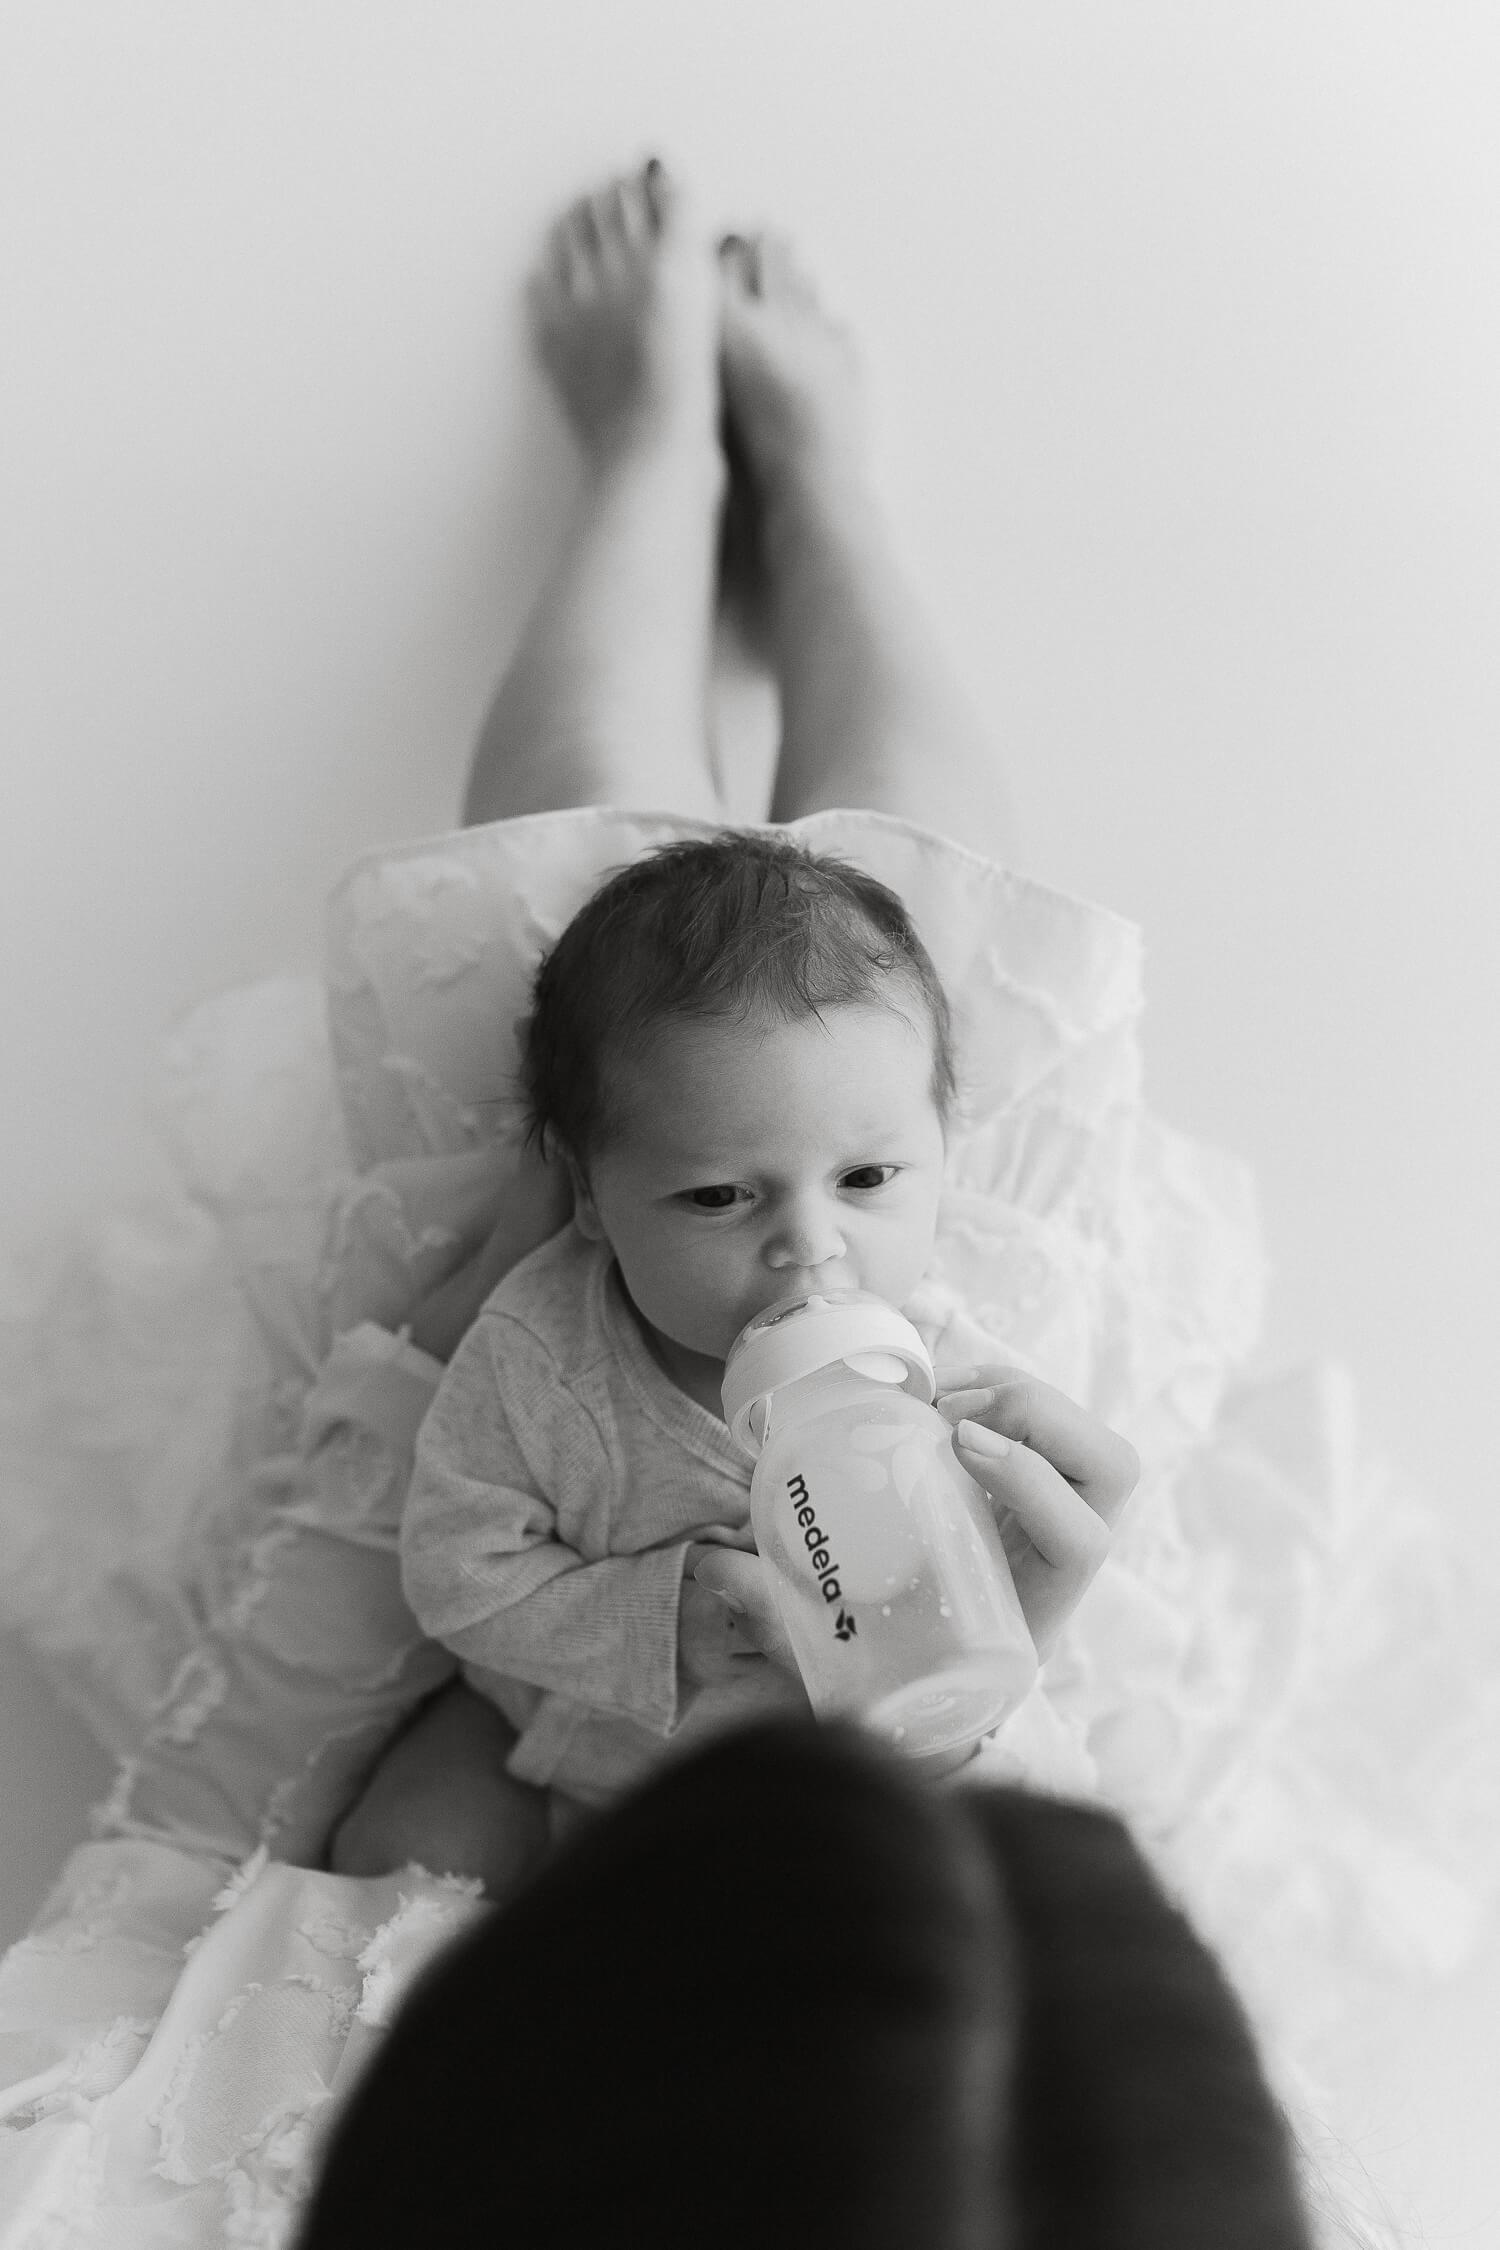 Helia Visuals workshop - ajatonta newbornkuvausta oppimassa. 31